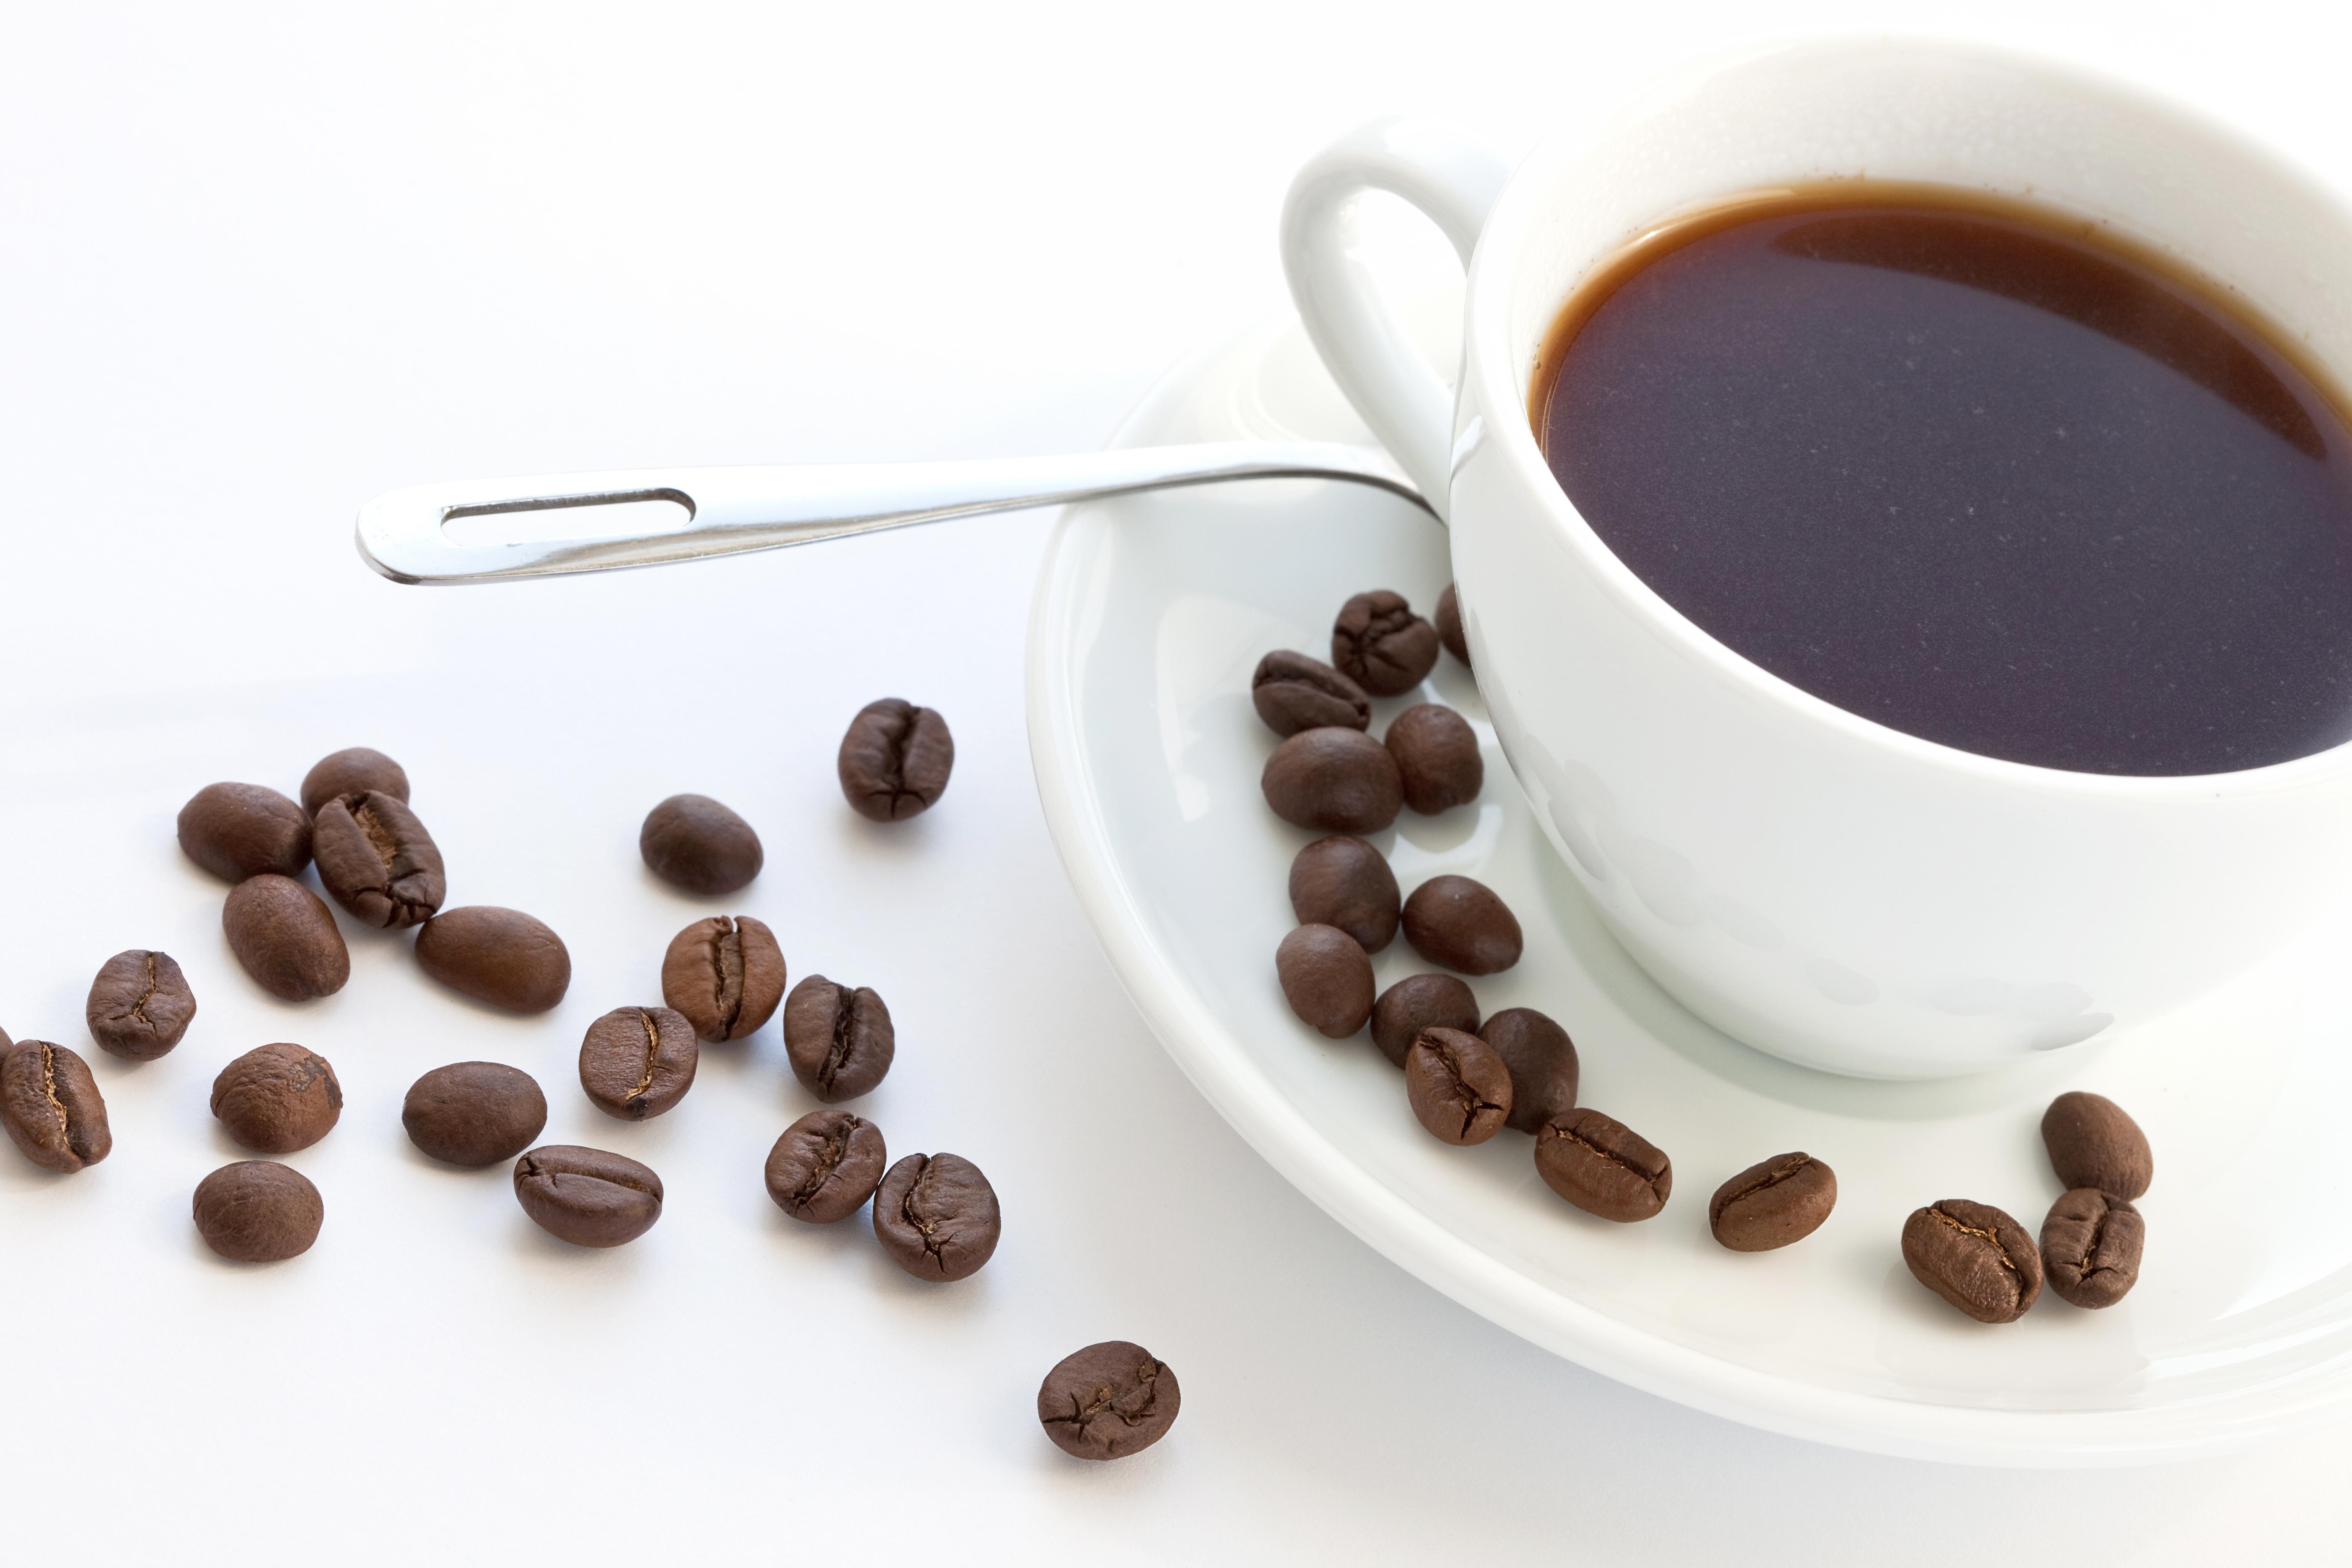 kaffe bönor